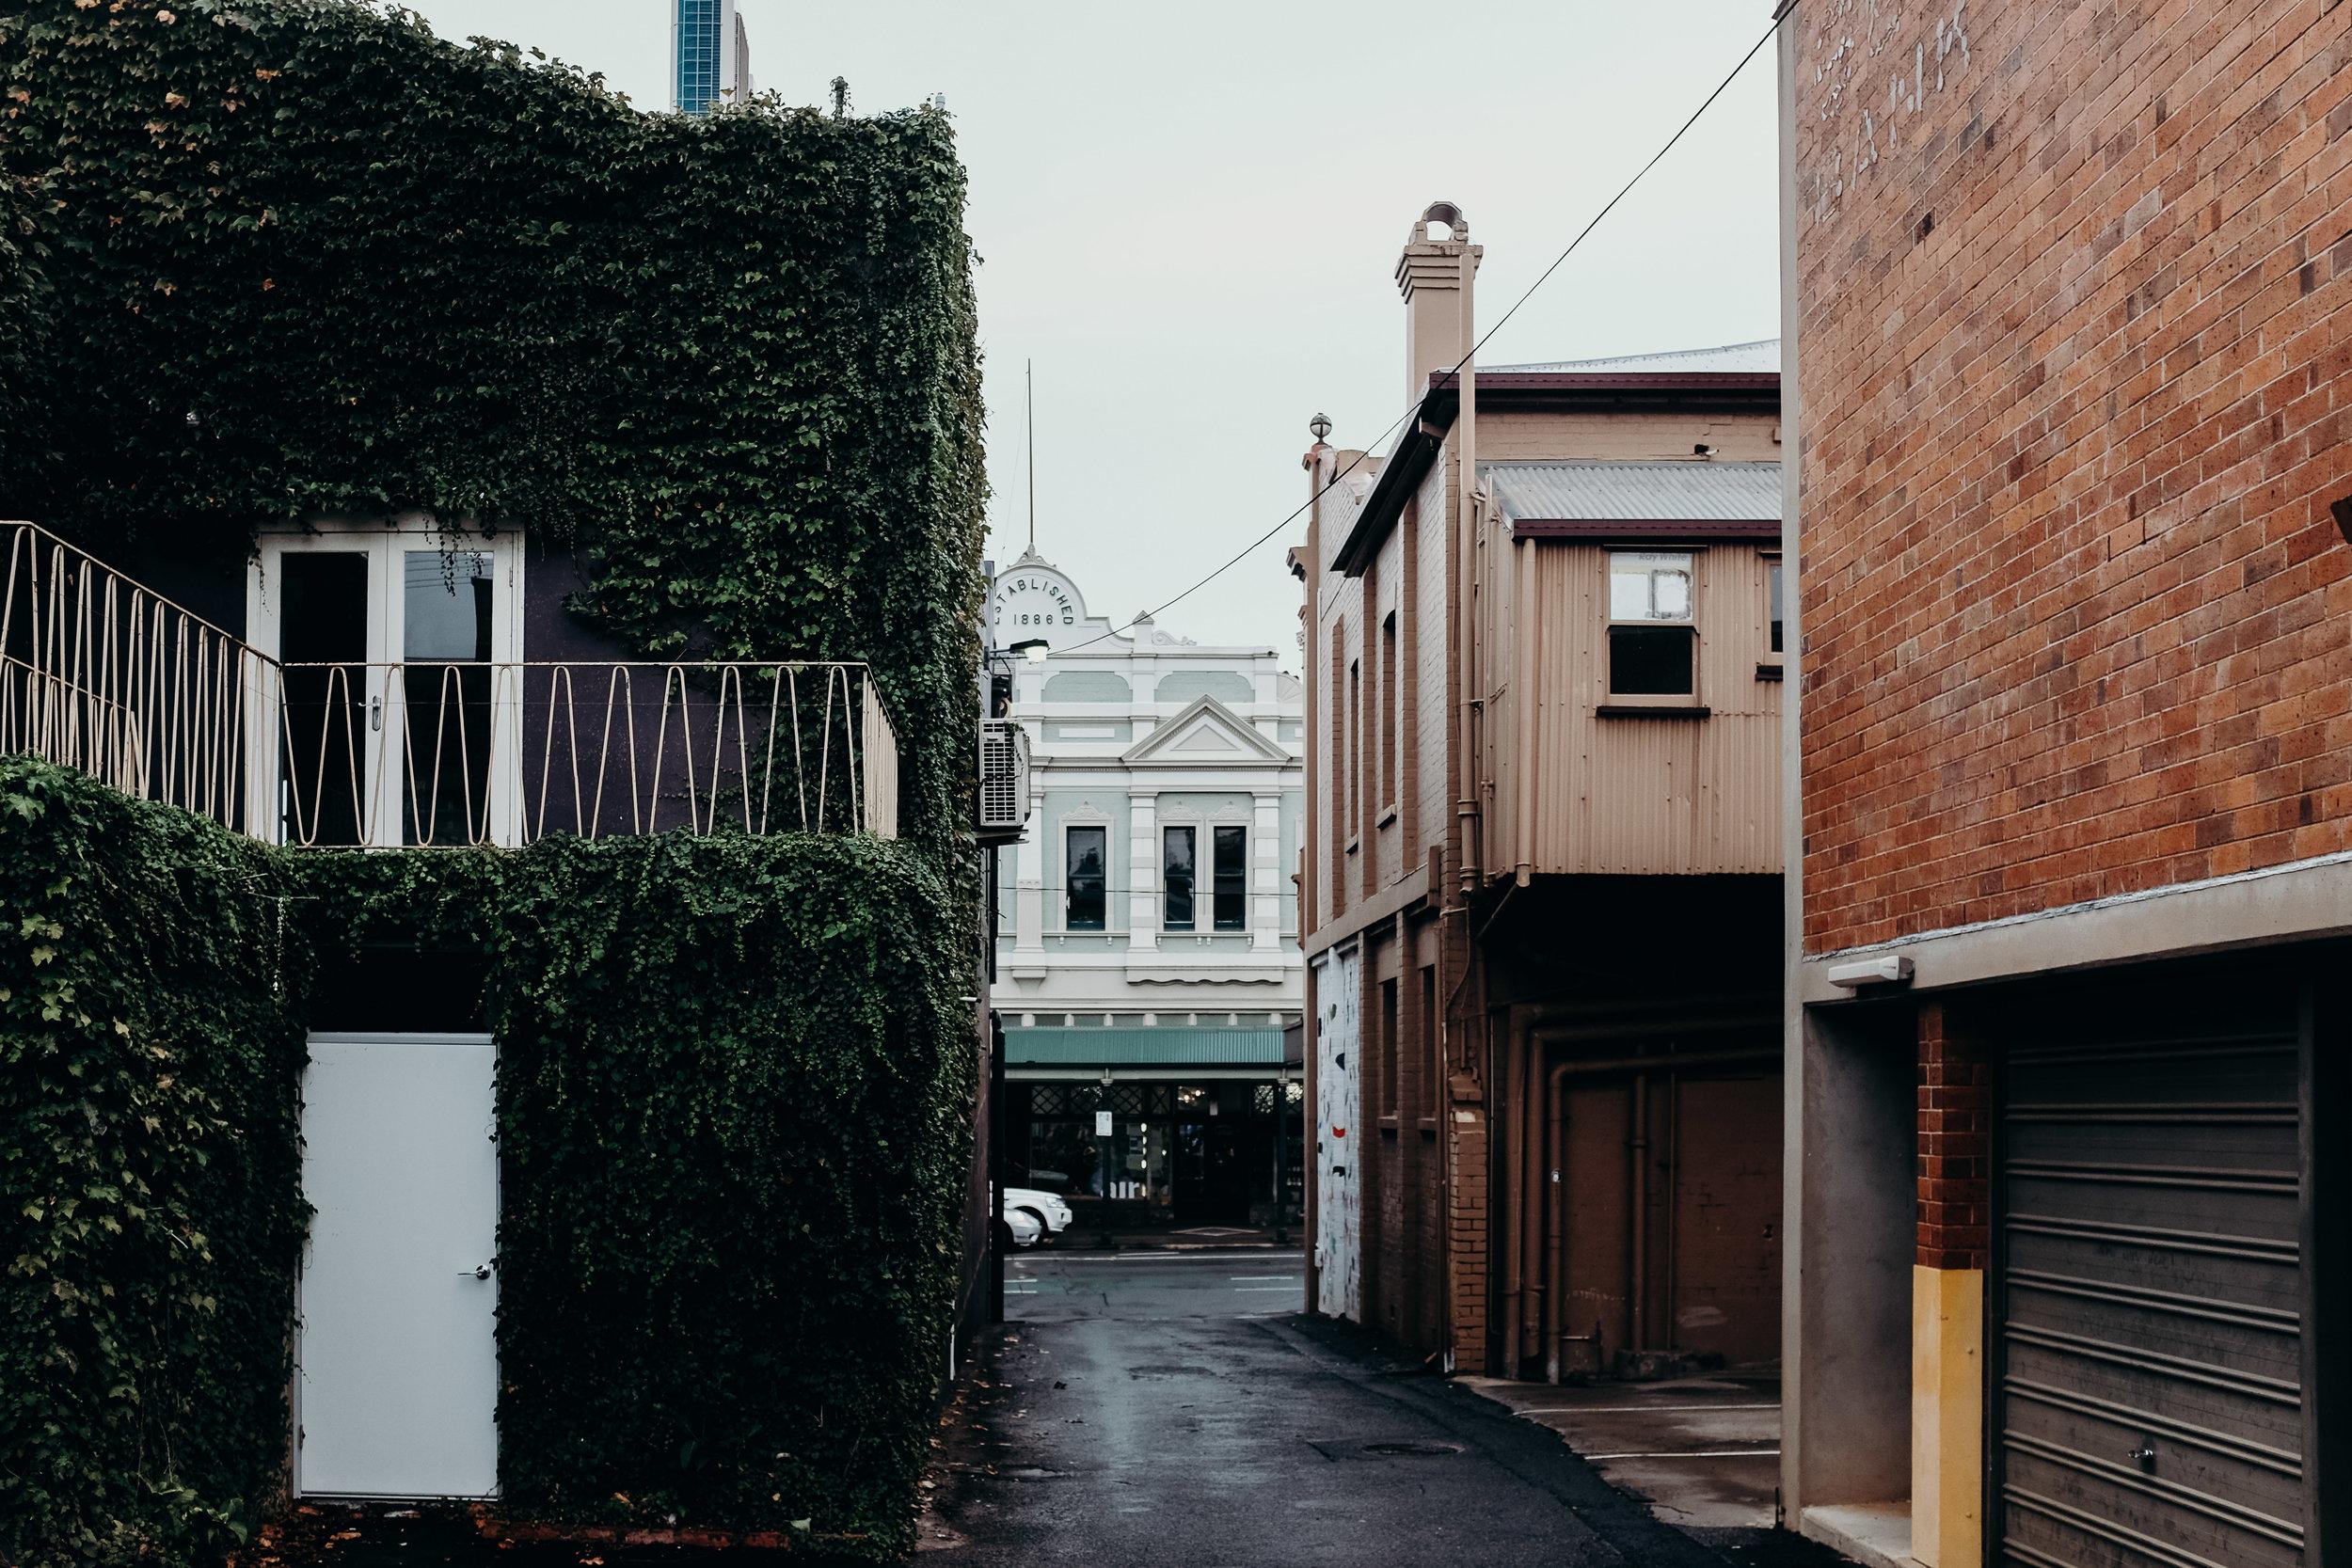 Streets & Lanes (9 of 9).jpg